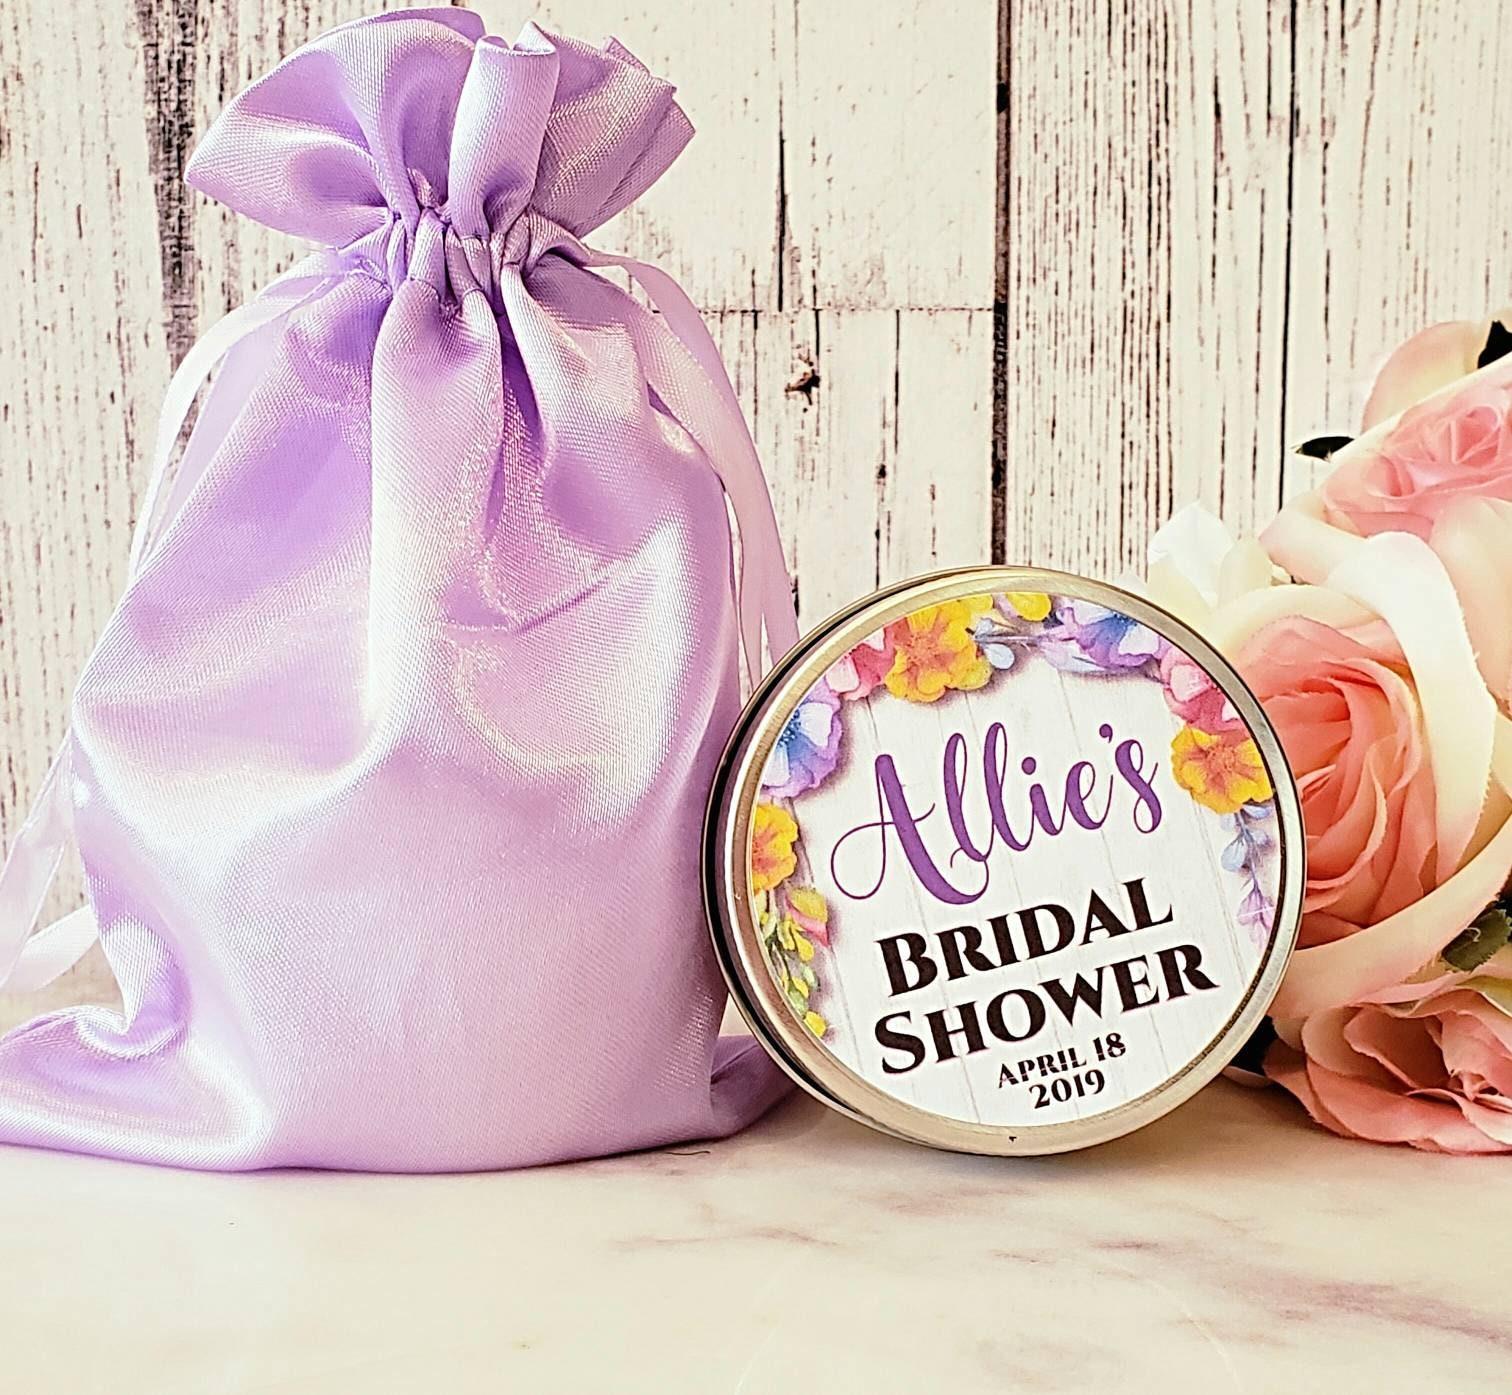 Tropical Bridal Shower Favors - Bridal shower candle favors ...